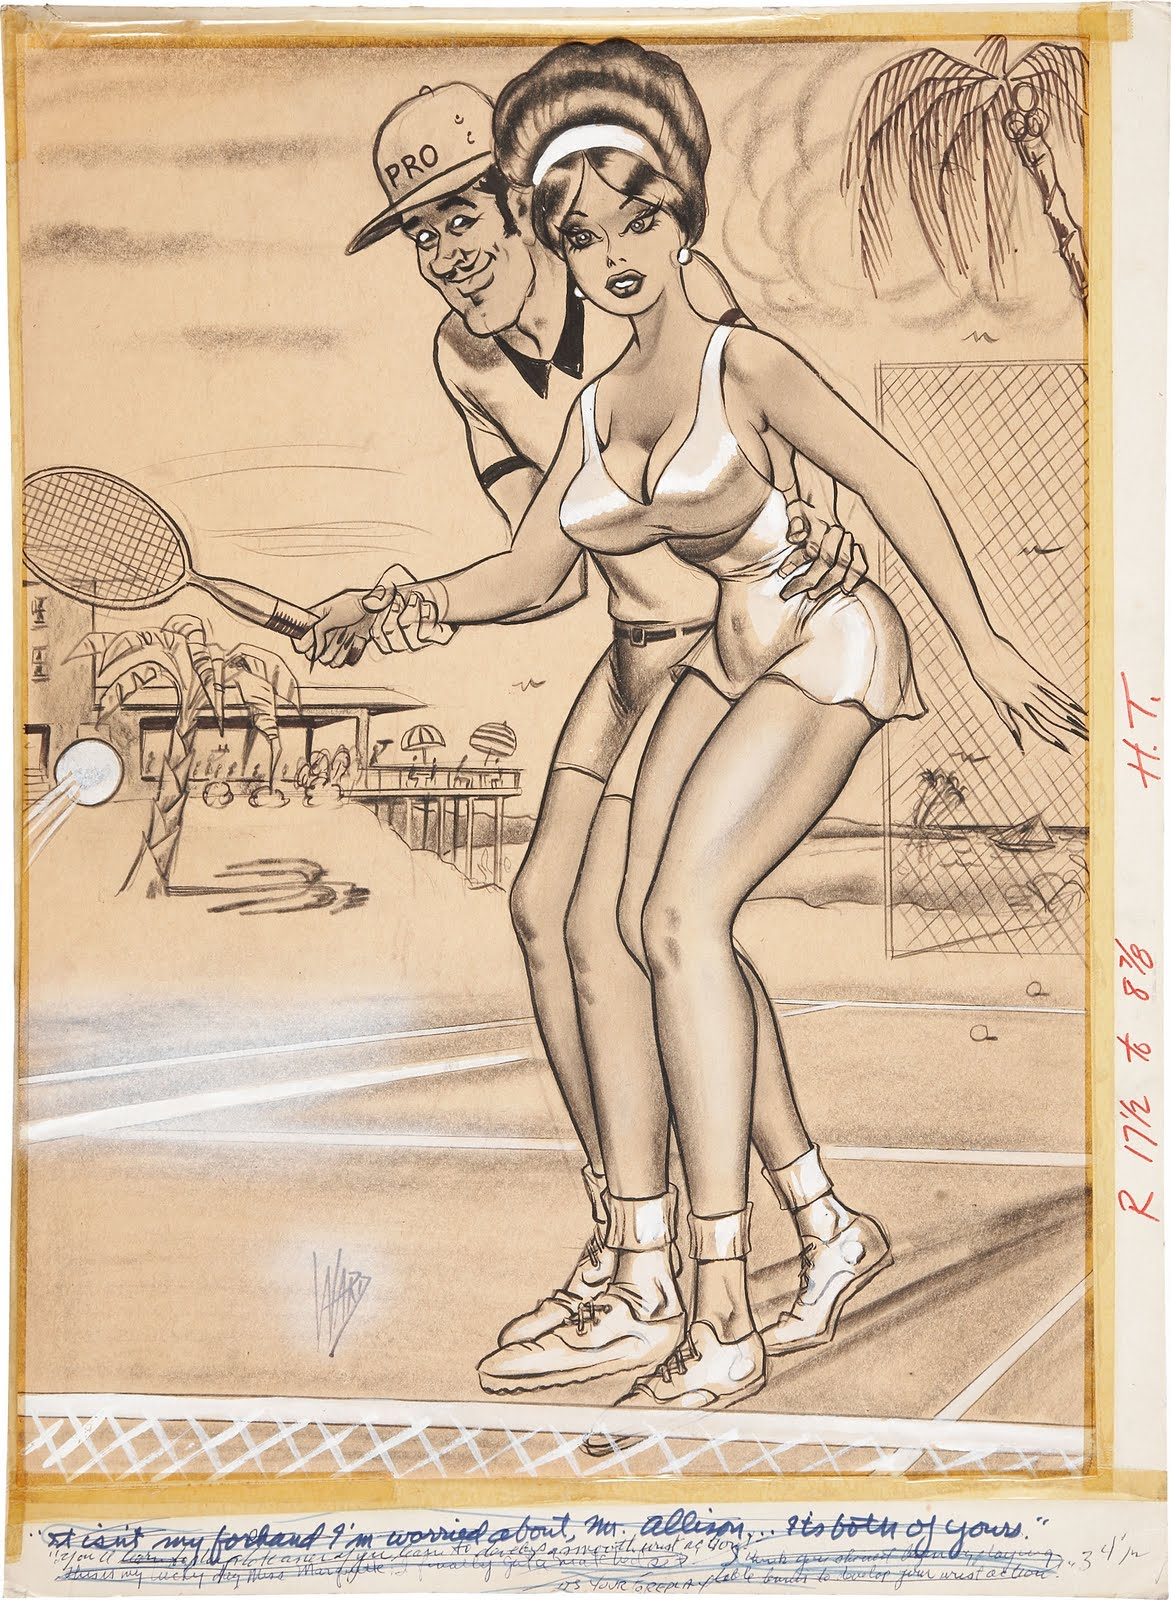 bill ward milf comic book